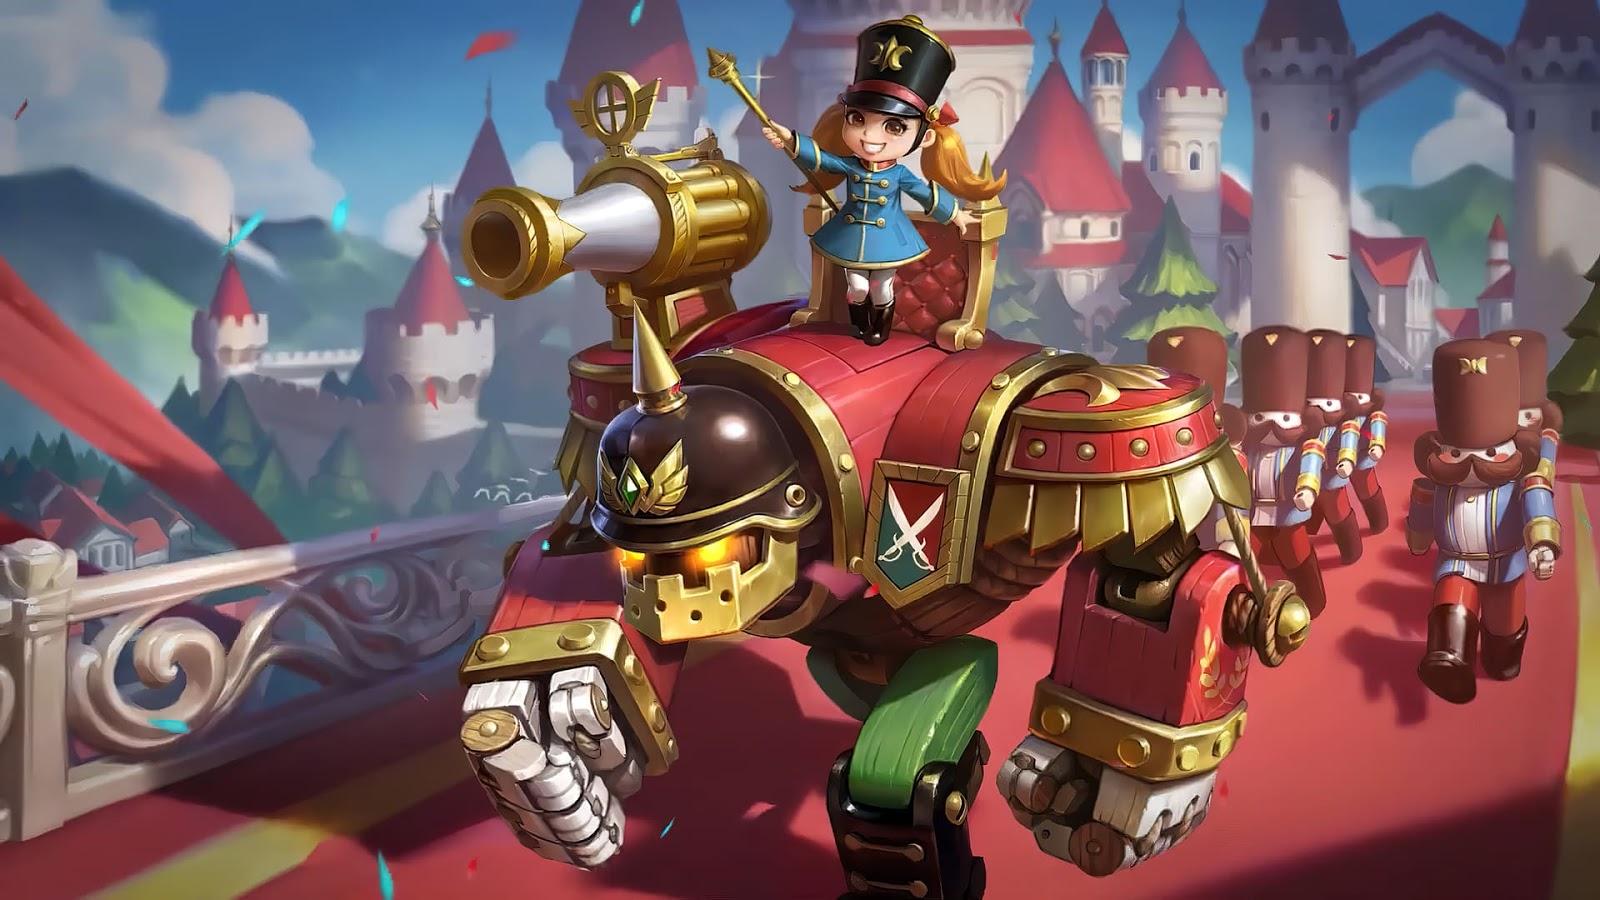 Wallpaper Jawhead The Nutcracker Skin Mobile Legends HD for PC